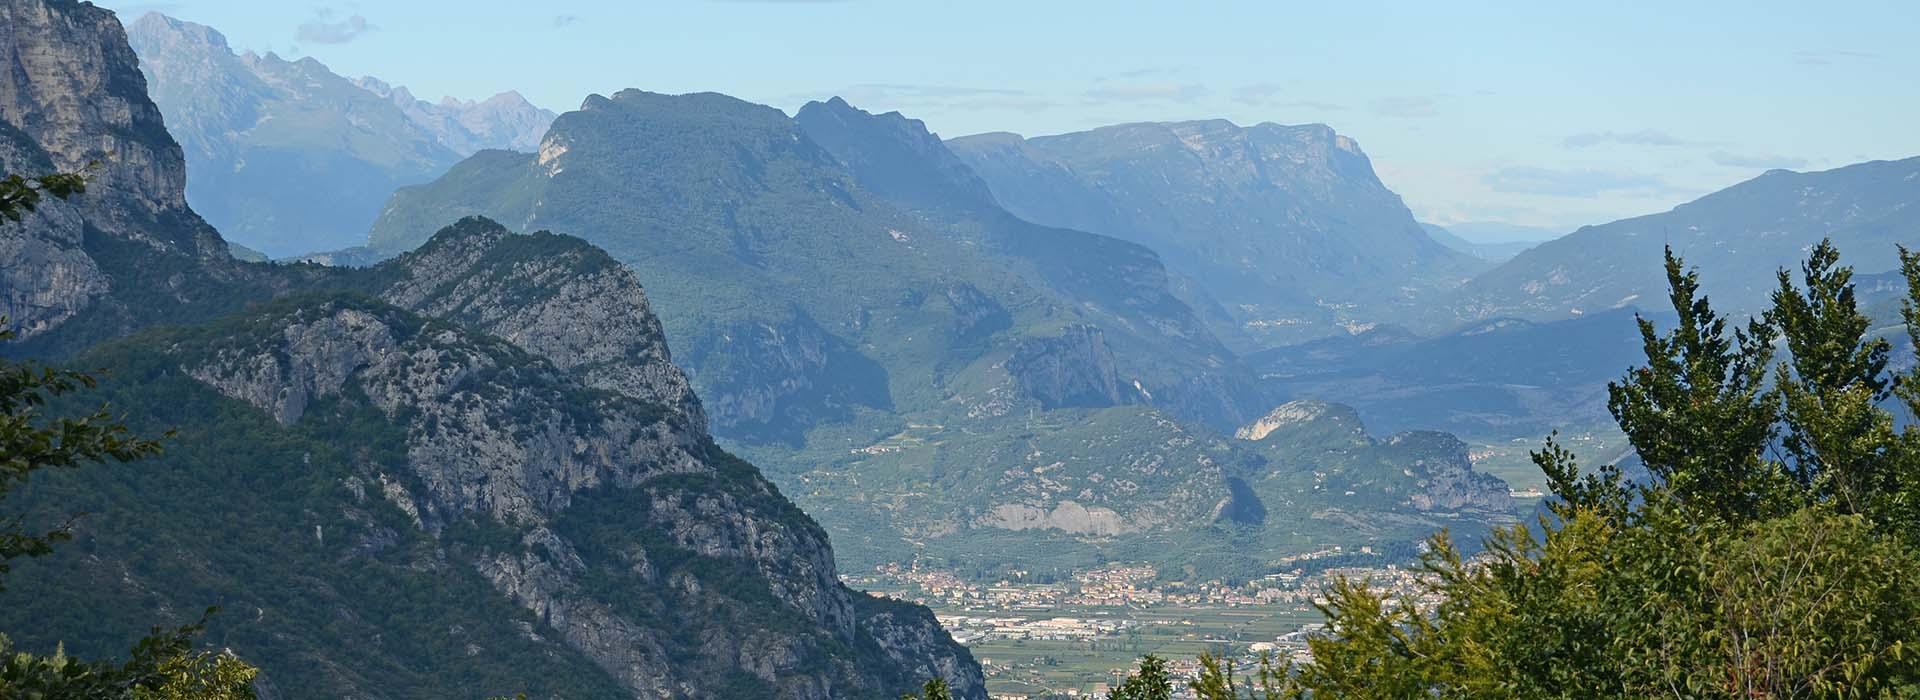 Monte Tremalzo